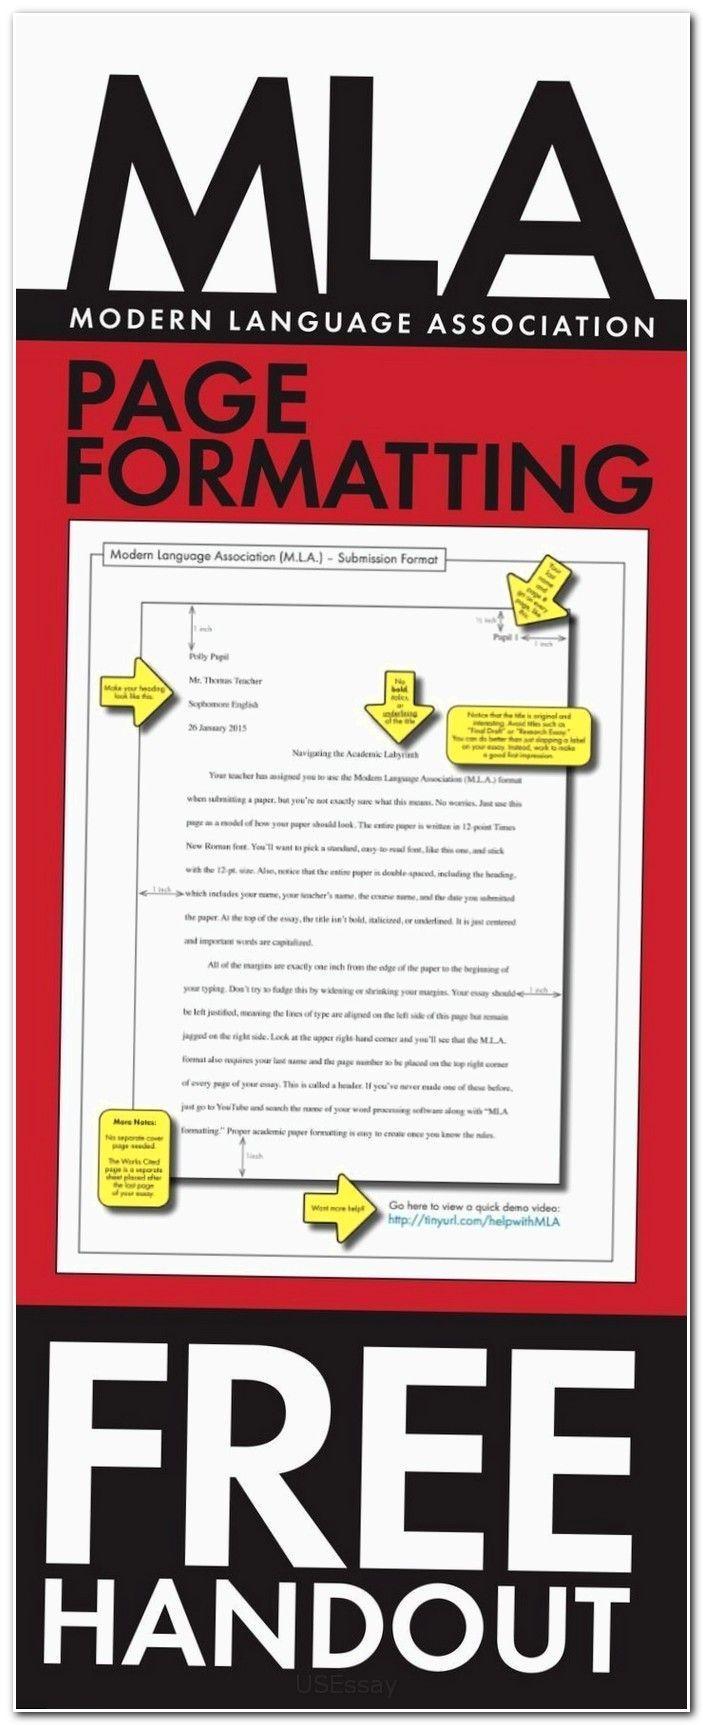 best sample proposal letter ideas pinterest essay wrightessay example for scholarship application write applying